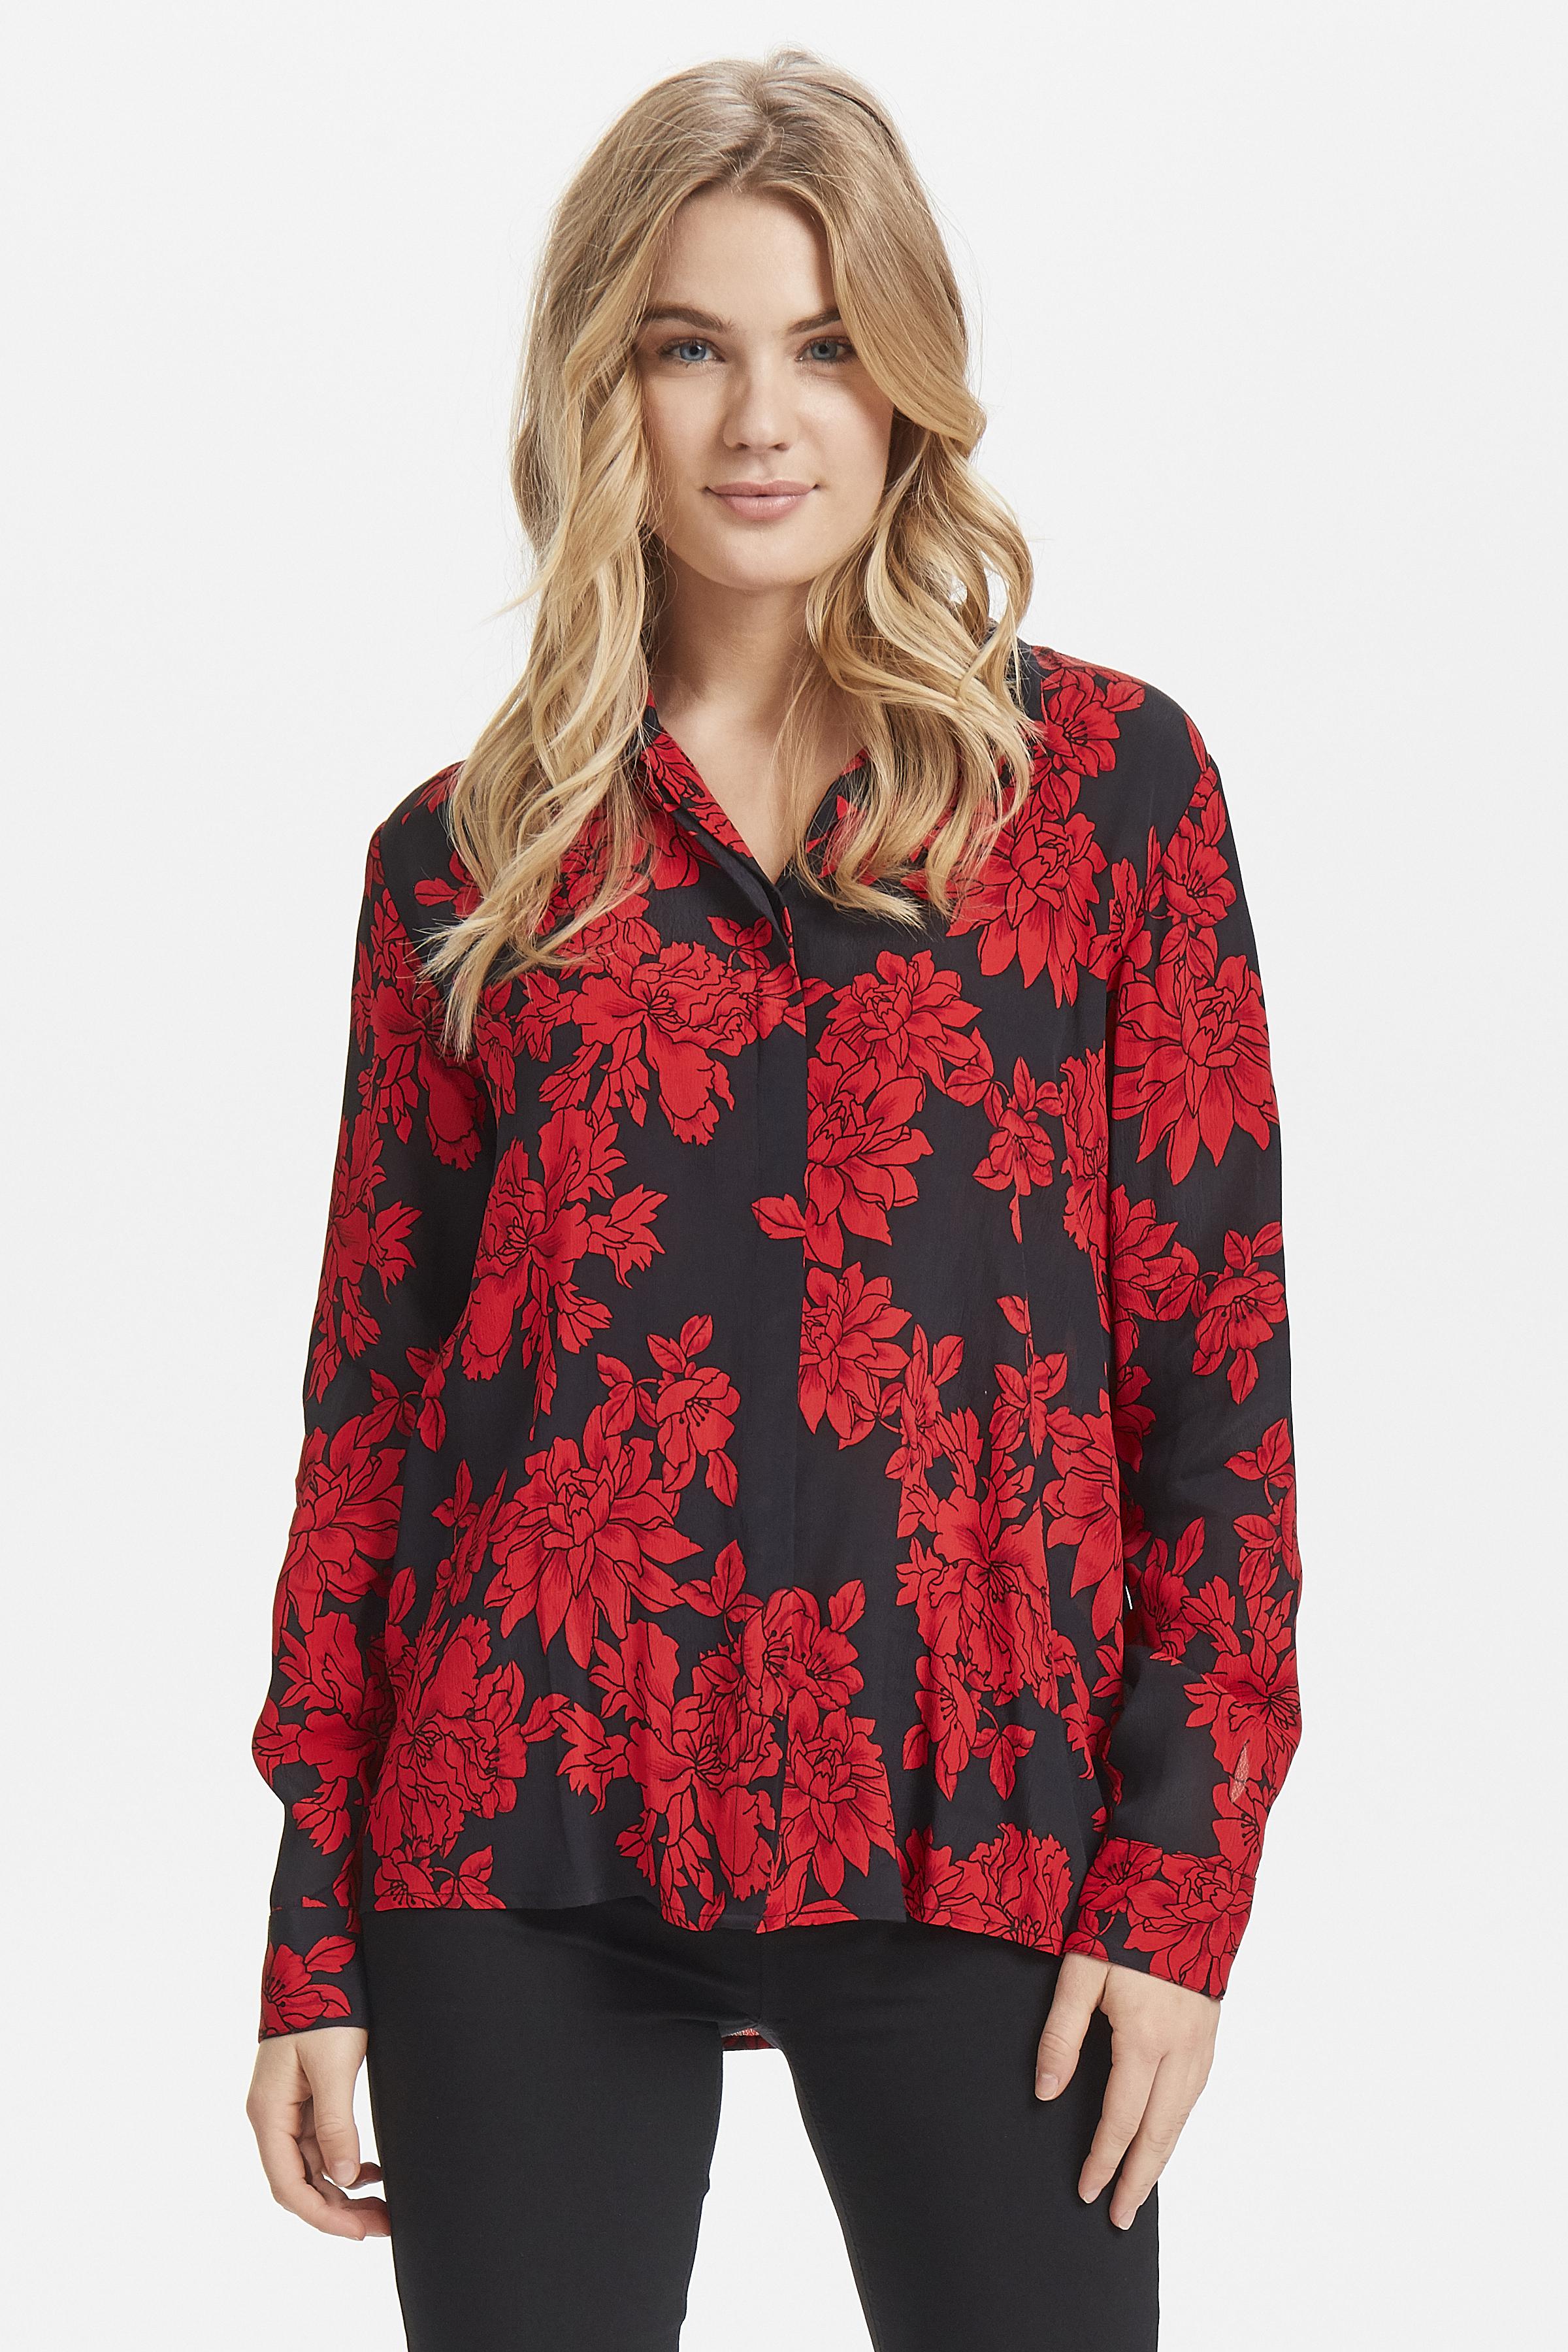 Black w. red flower Langærmet skjorte fra b.young – Køb Black w. red flower Langærmet skjorte fra str. 36-44 her